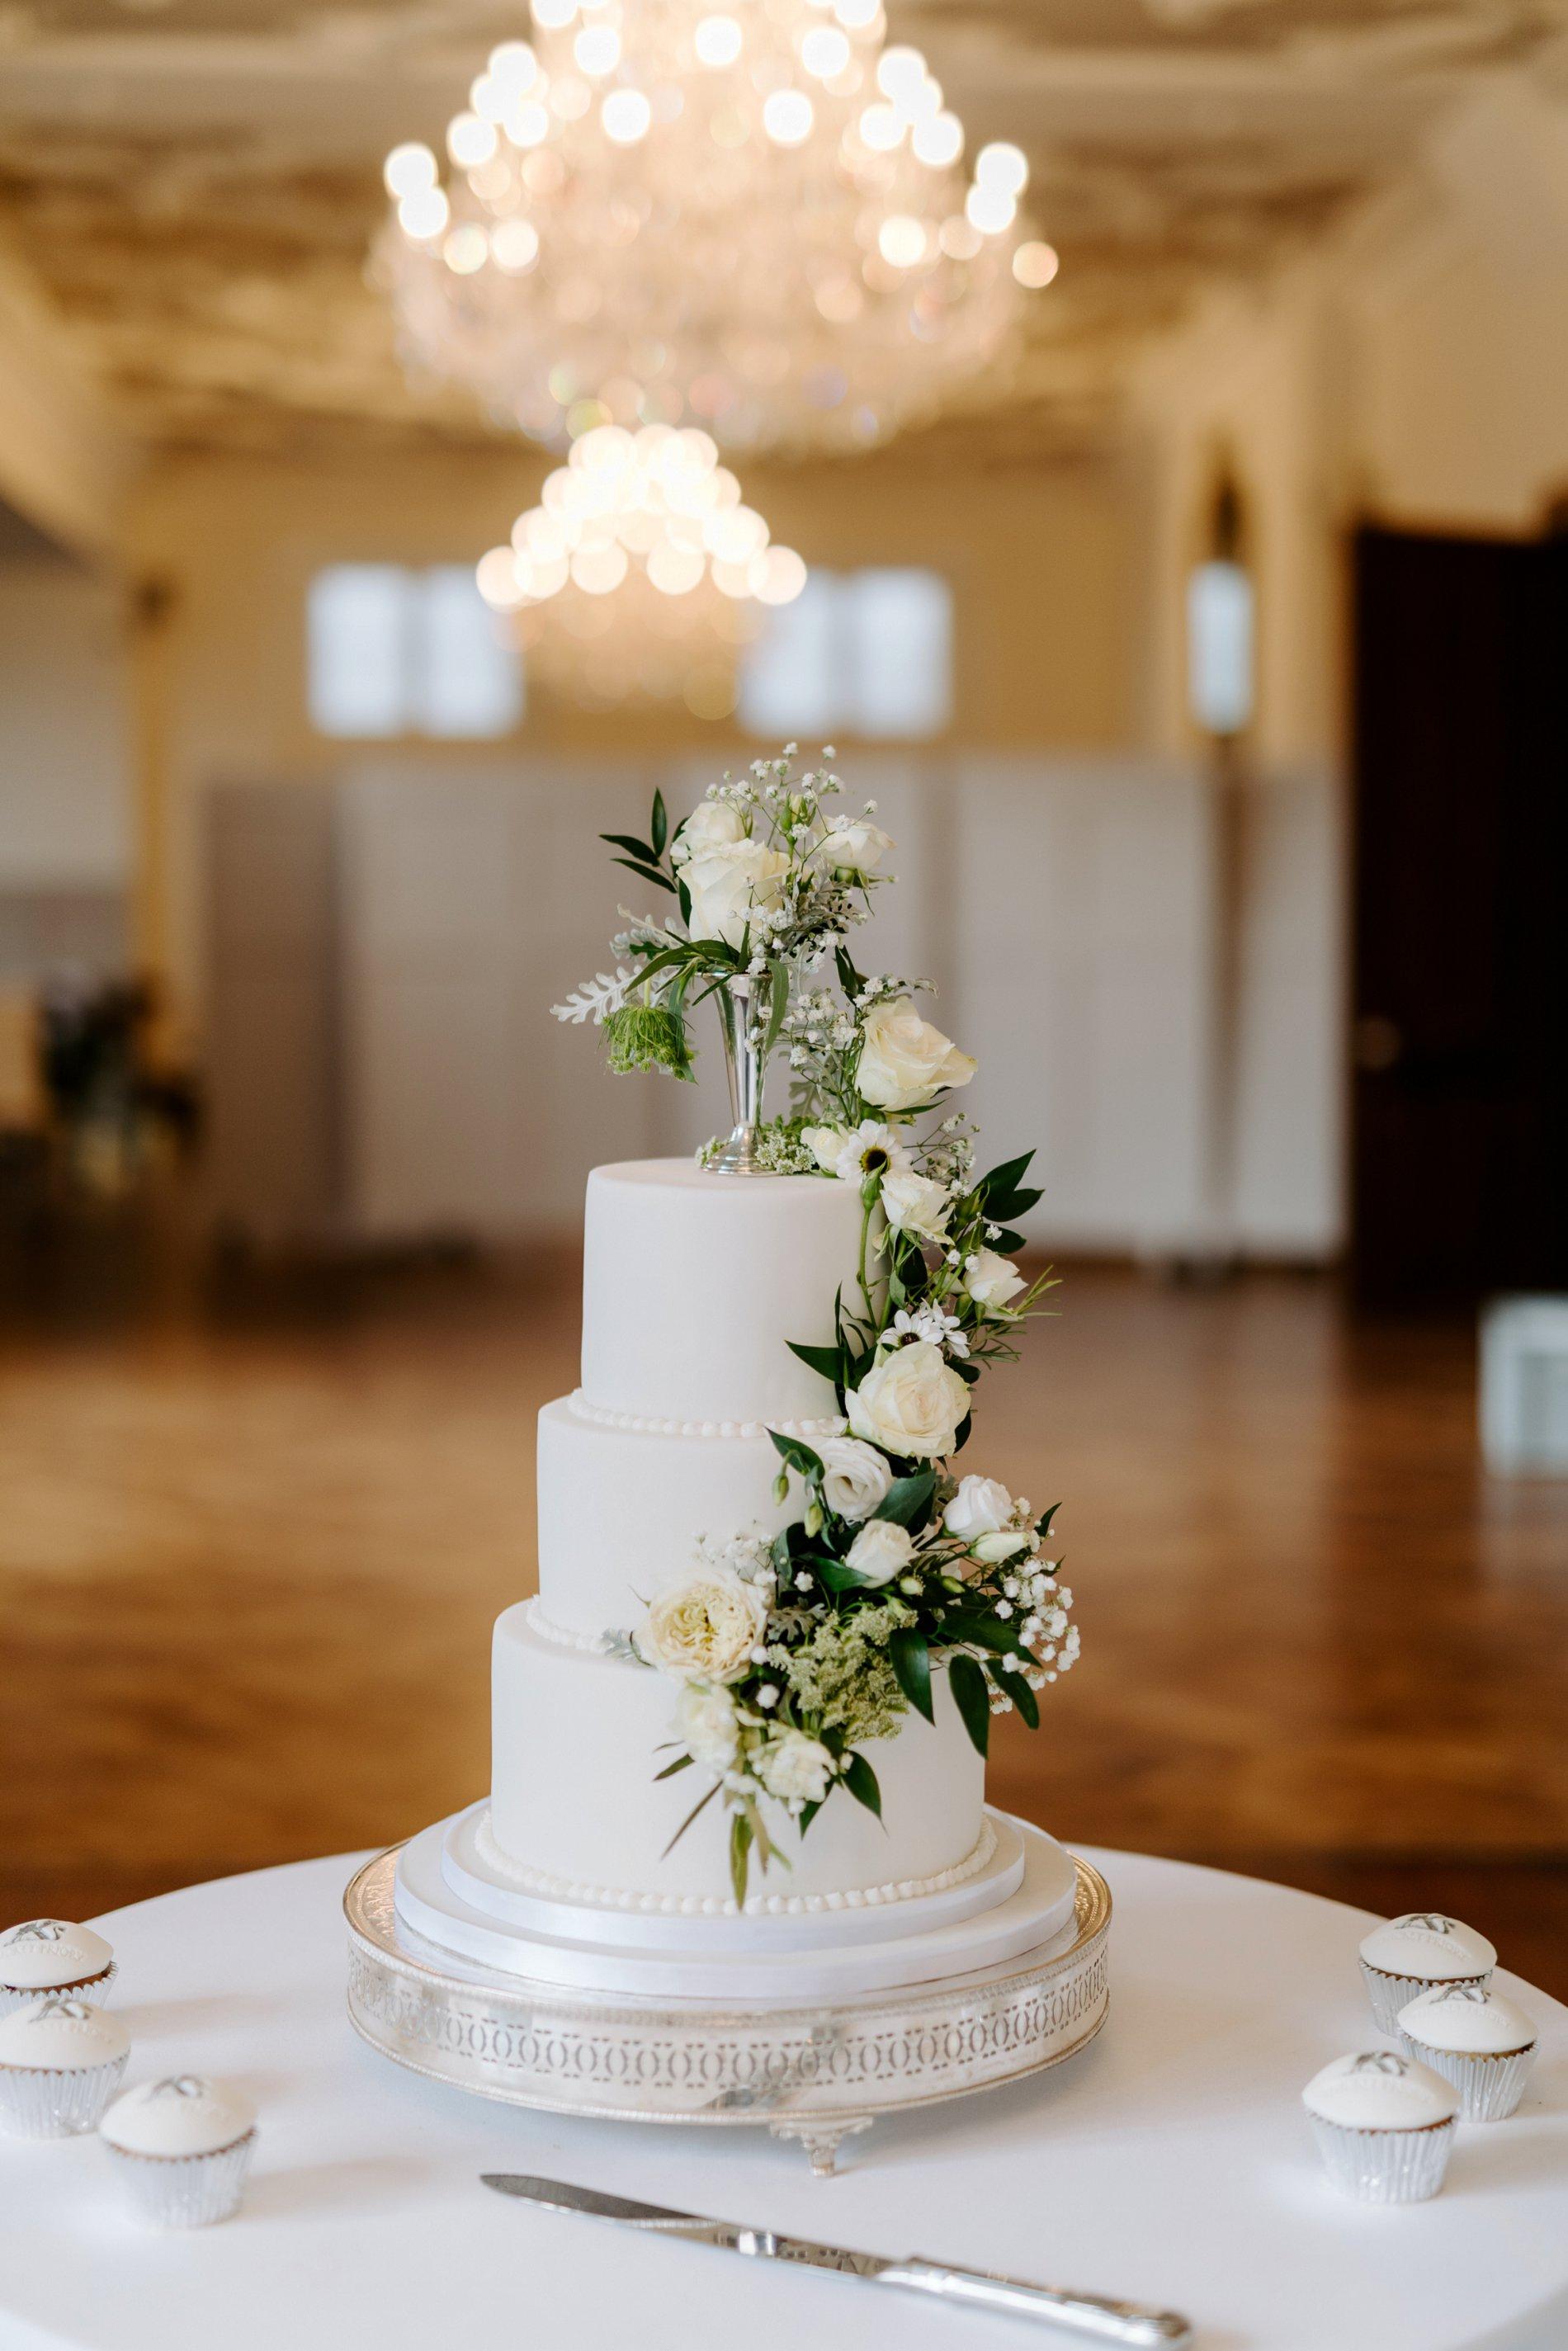 An Elegant White Wedding at Thicket Priory (c) Carla Whittingham Photography (48)